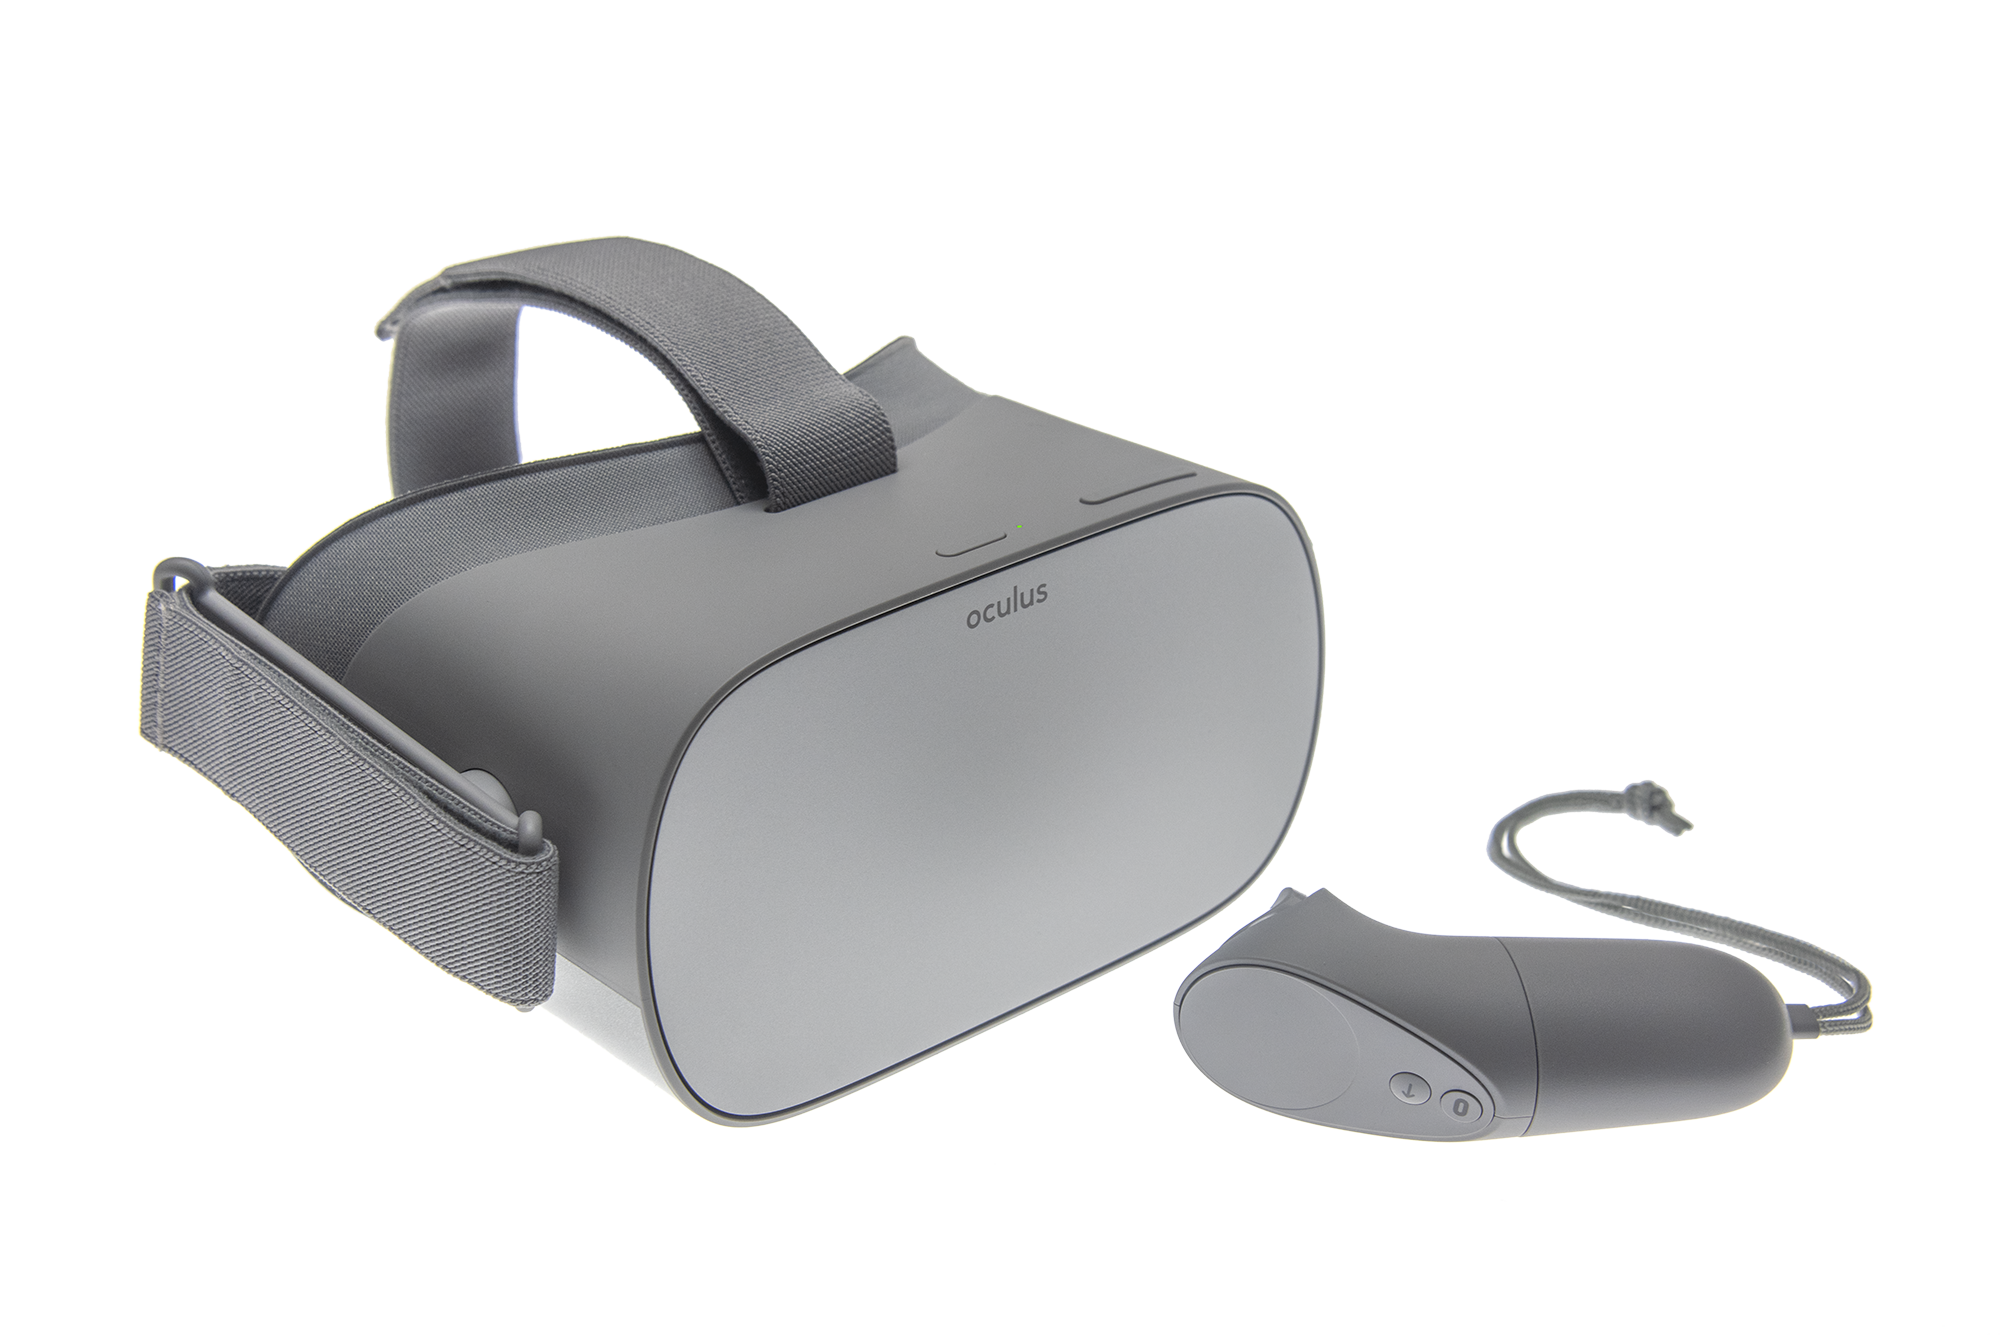 Oculus_8101651_low.png